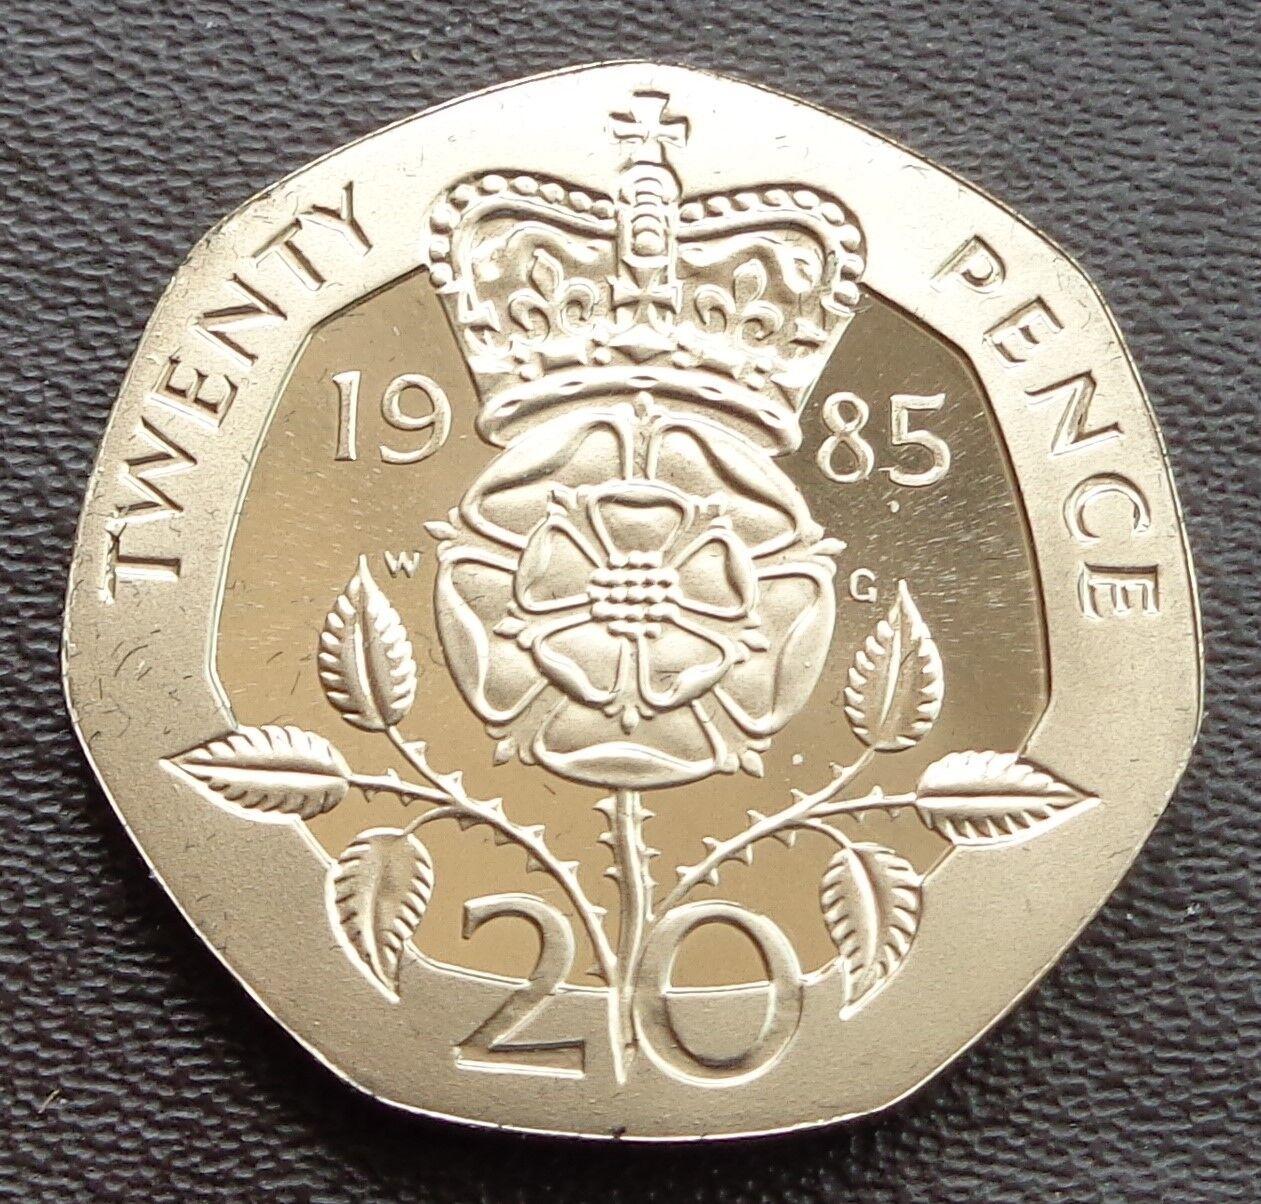 1983 - 2017 Elizabeth II 20p Twenty Decimal Proof Coin - Choose Your Year